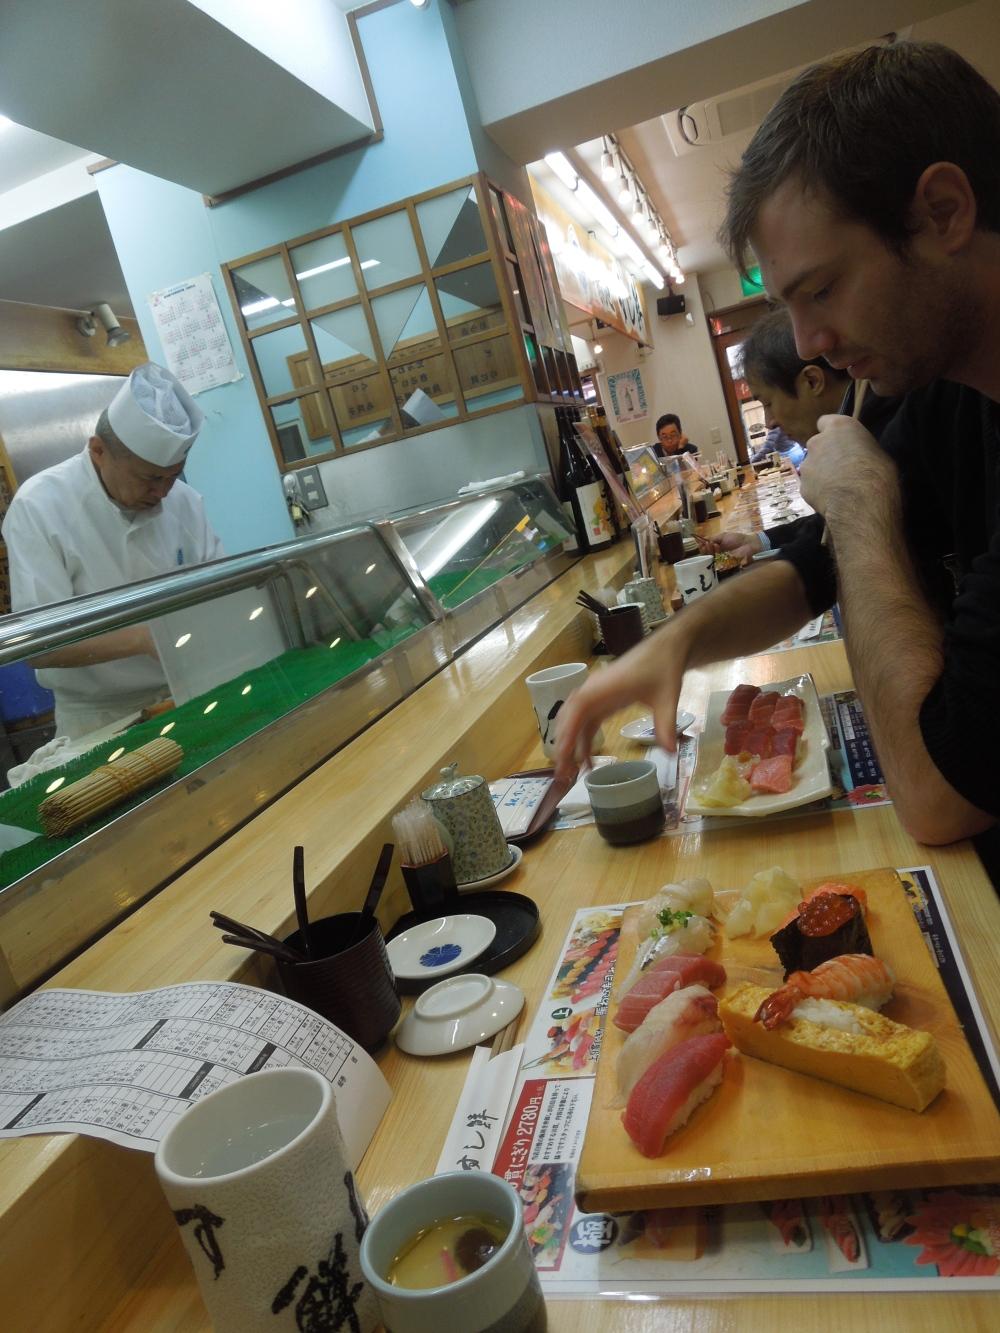 Restaurant à sushi, Tsukiji Market, Japon